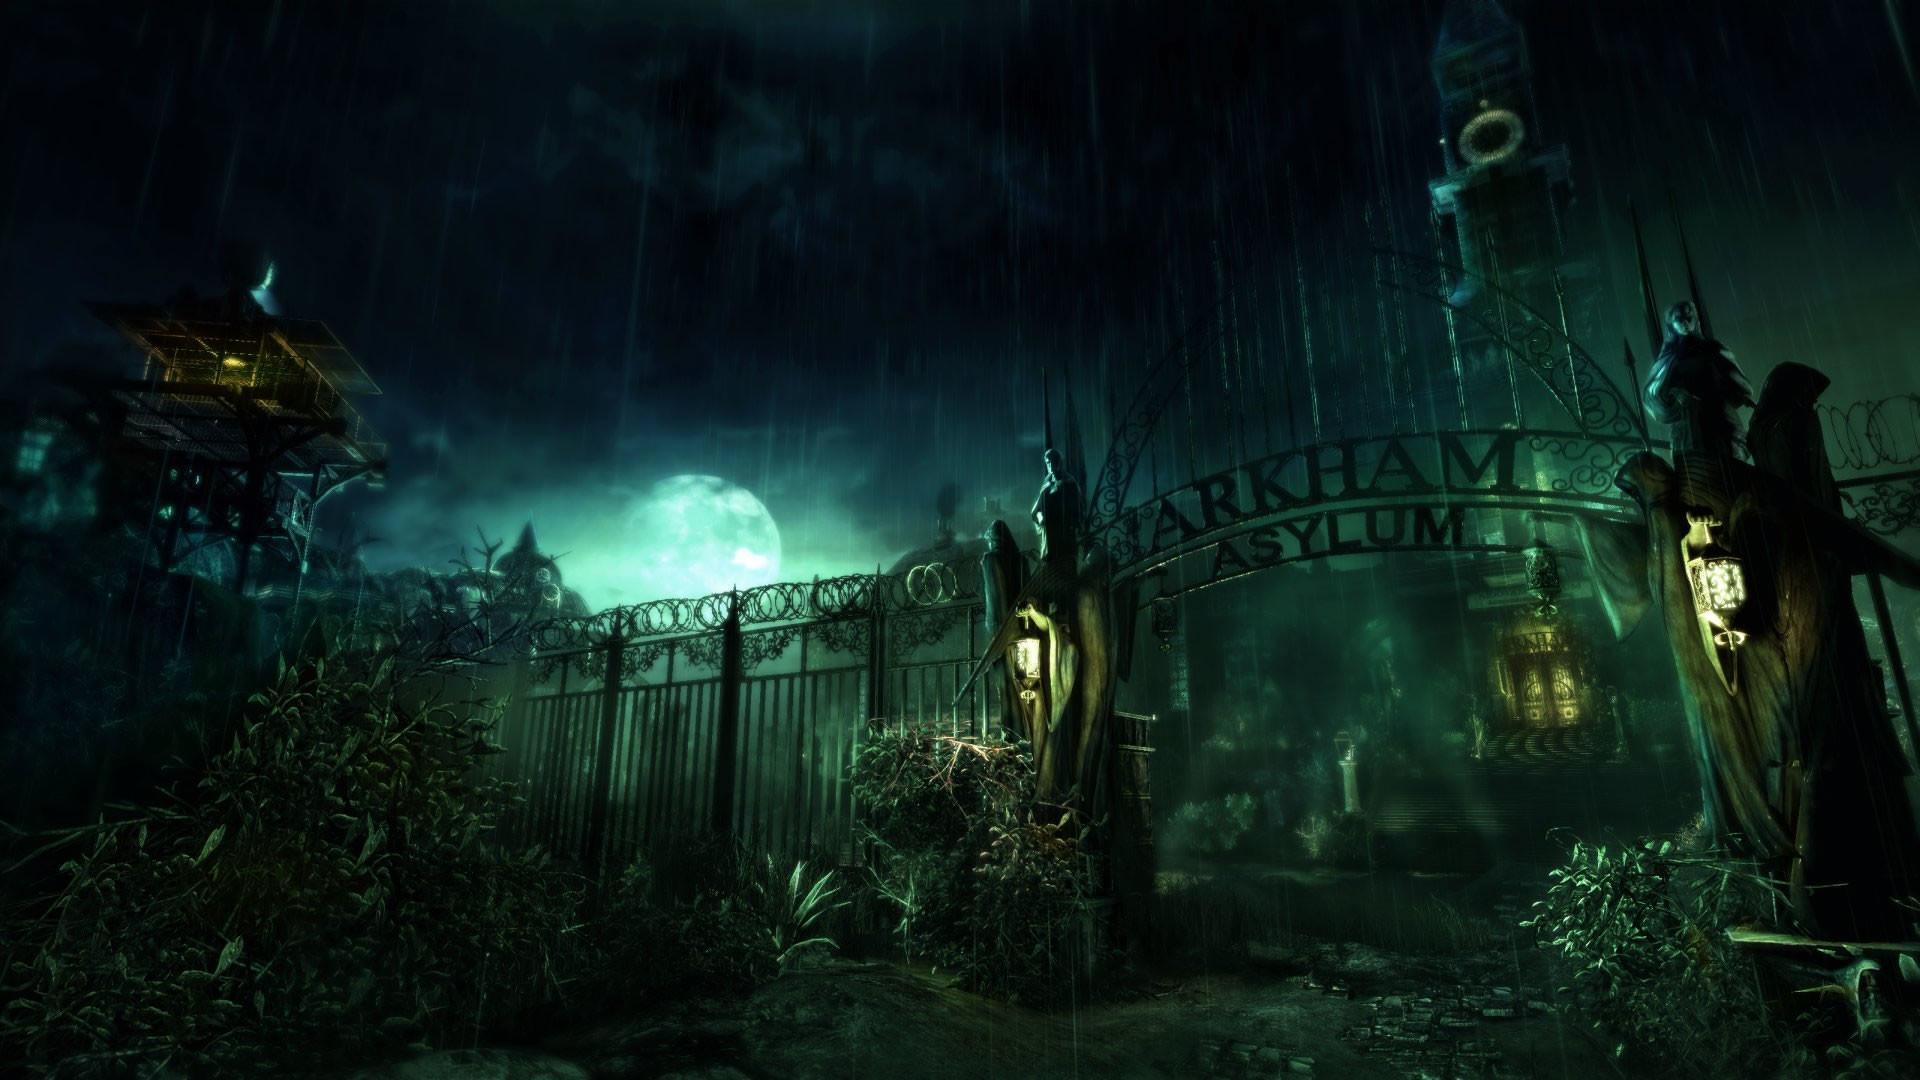 asylum-batman-arkham-background-wallpapers-cool-desktop-wallpaper-